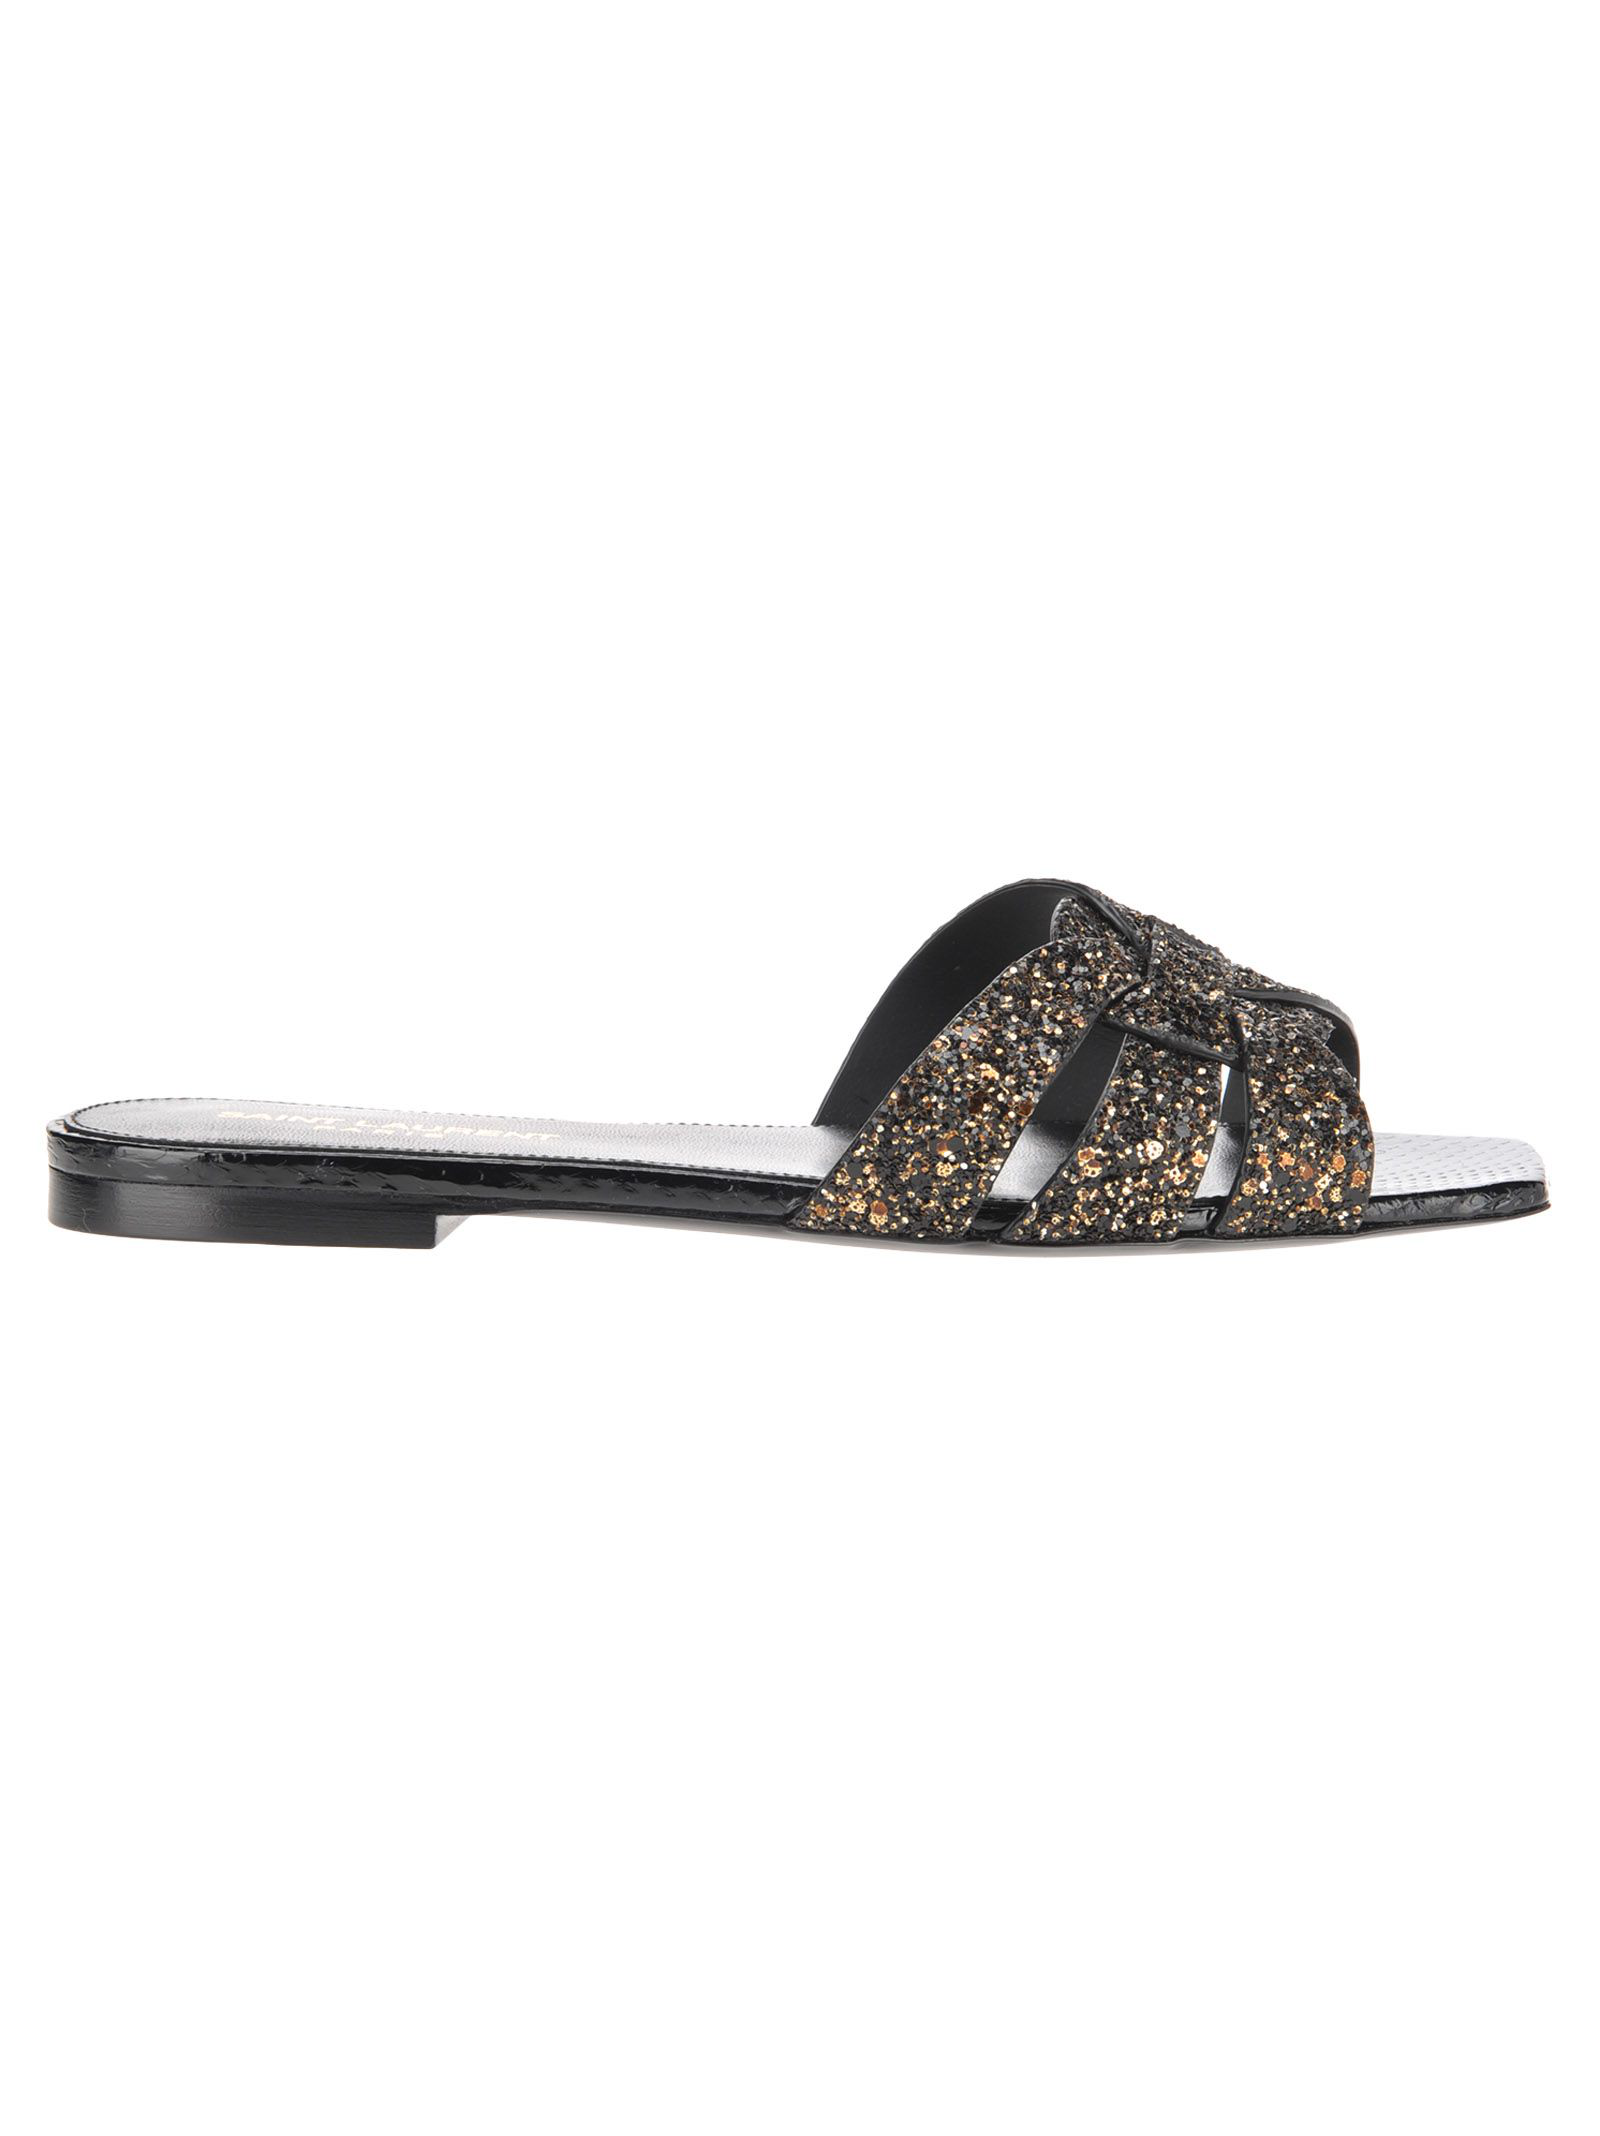 93deaf6ac4e Saint Laurent Tribute Flat Sandals In Glitter And Ayers In 1741 Nero/Glit Or